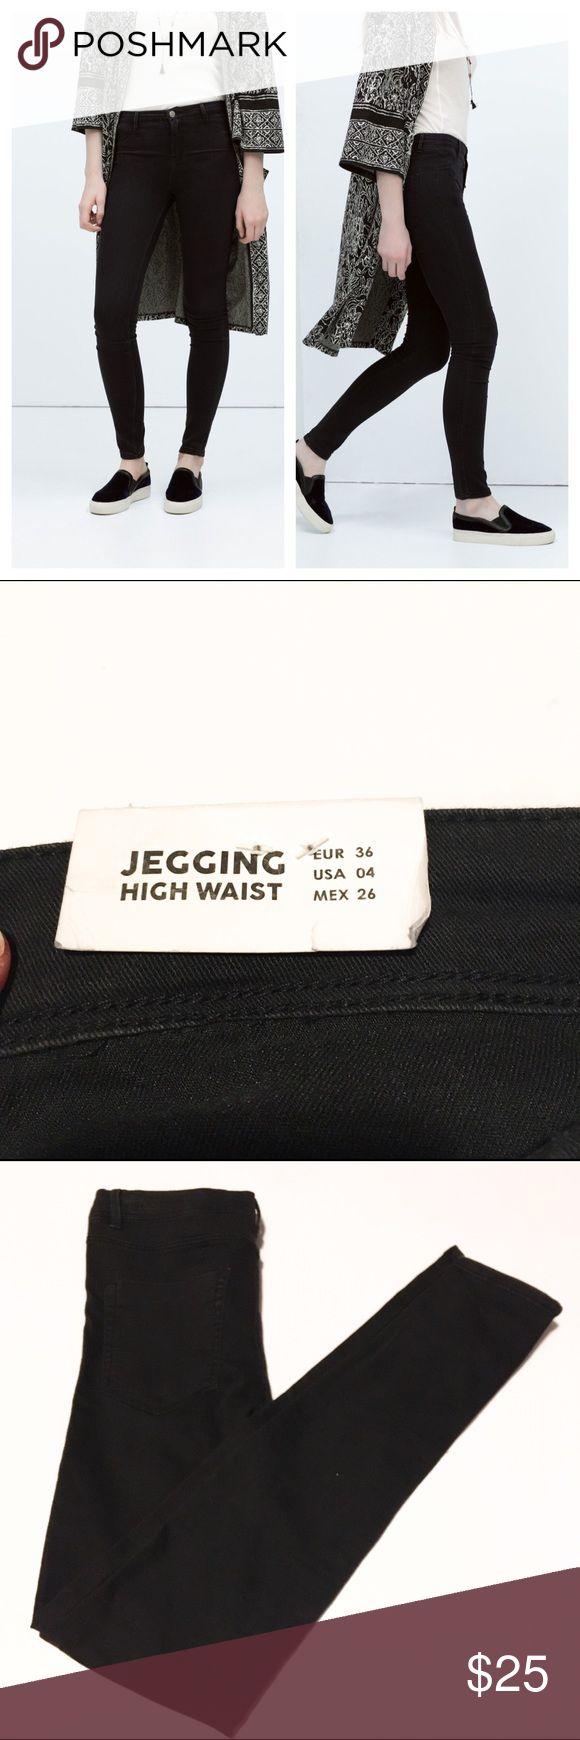 NWT Zara Black High Waist Jegging These are NWT Zara Black High Waist Jegging. In excellent condition. Never worn. Zara Jeans Skinny